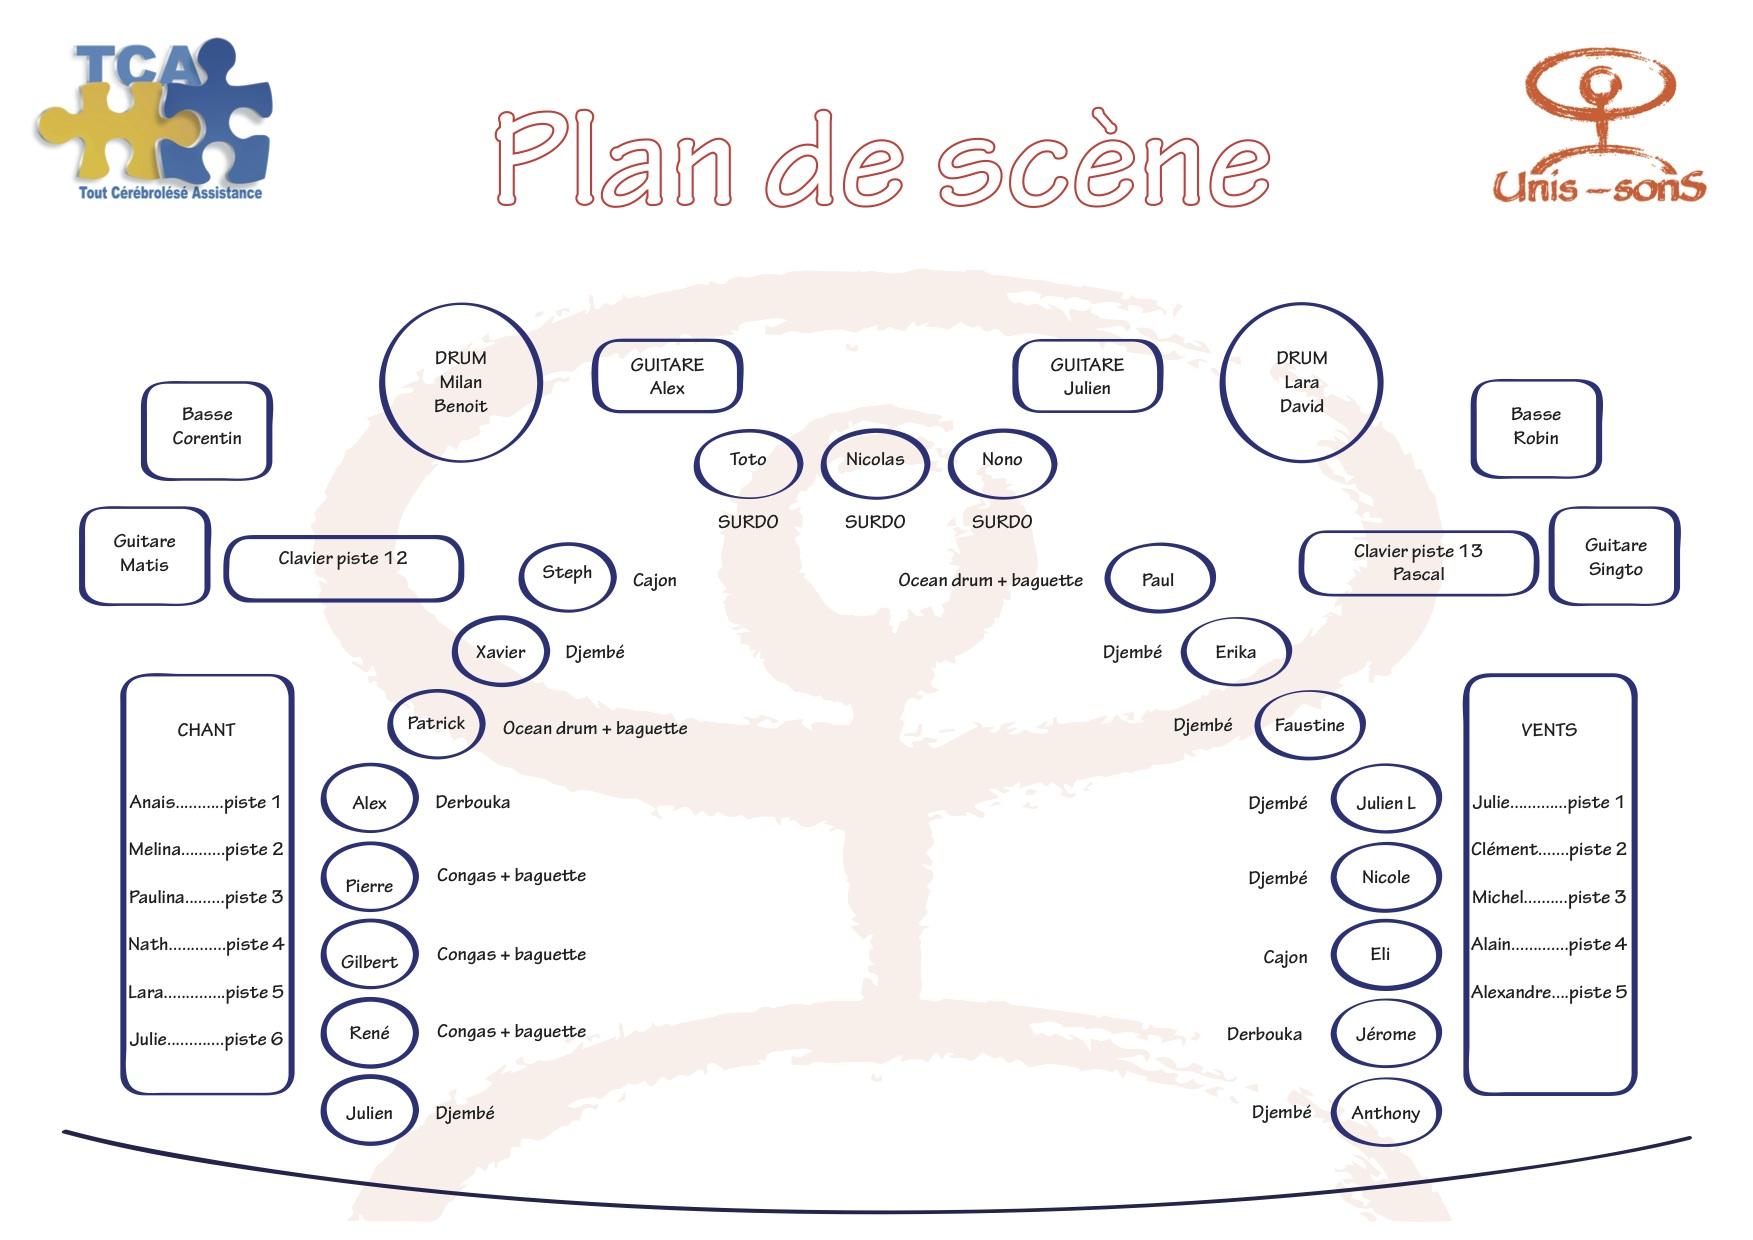 Plan de scéne UNISSONS